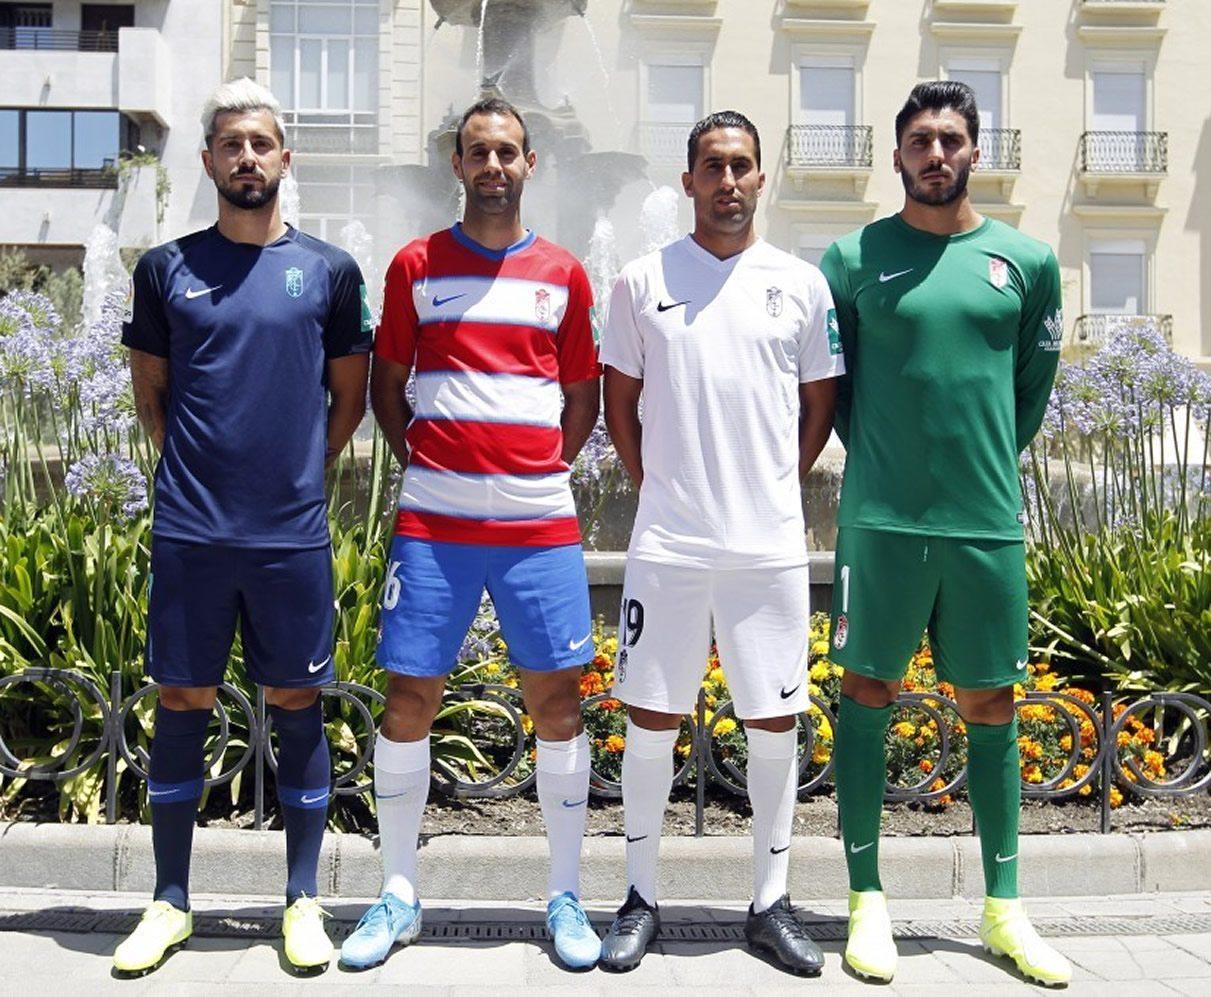 Equipaciones Nike del Granada CF 2019/20 | Imagen Twitter Oficial